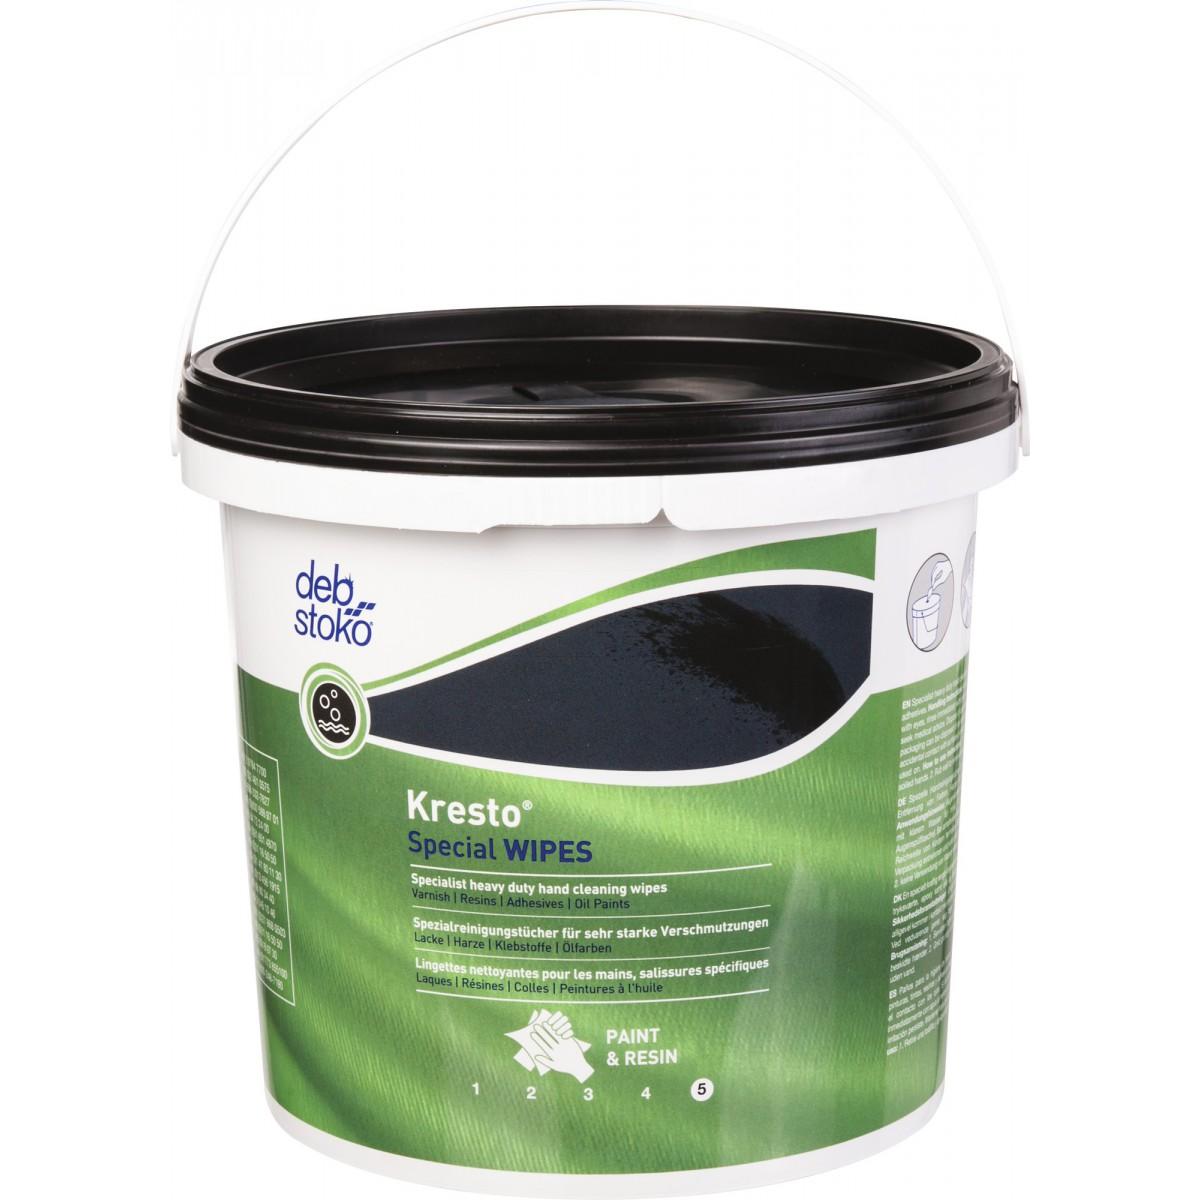 Lingette nettoyante Kresto Special Wipes - Deb stoko